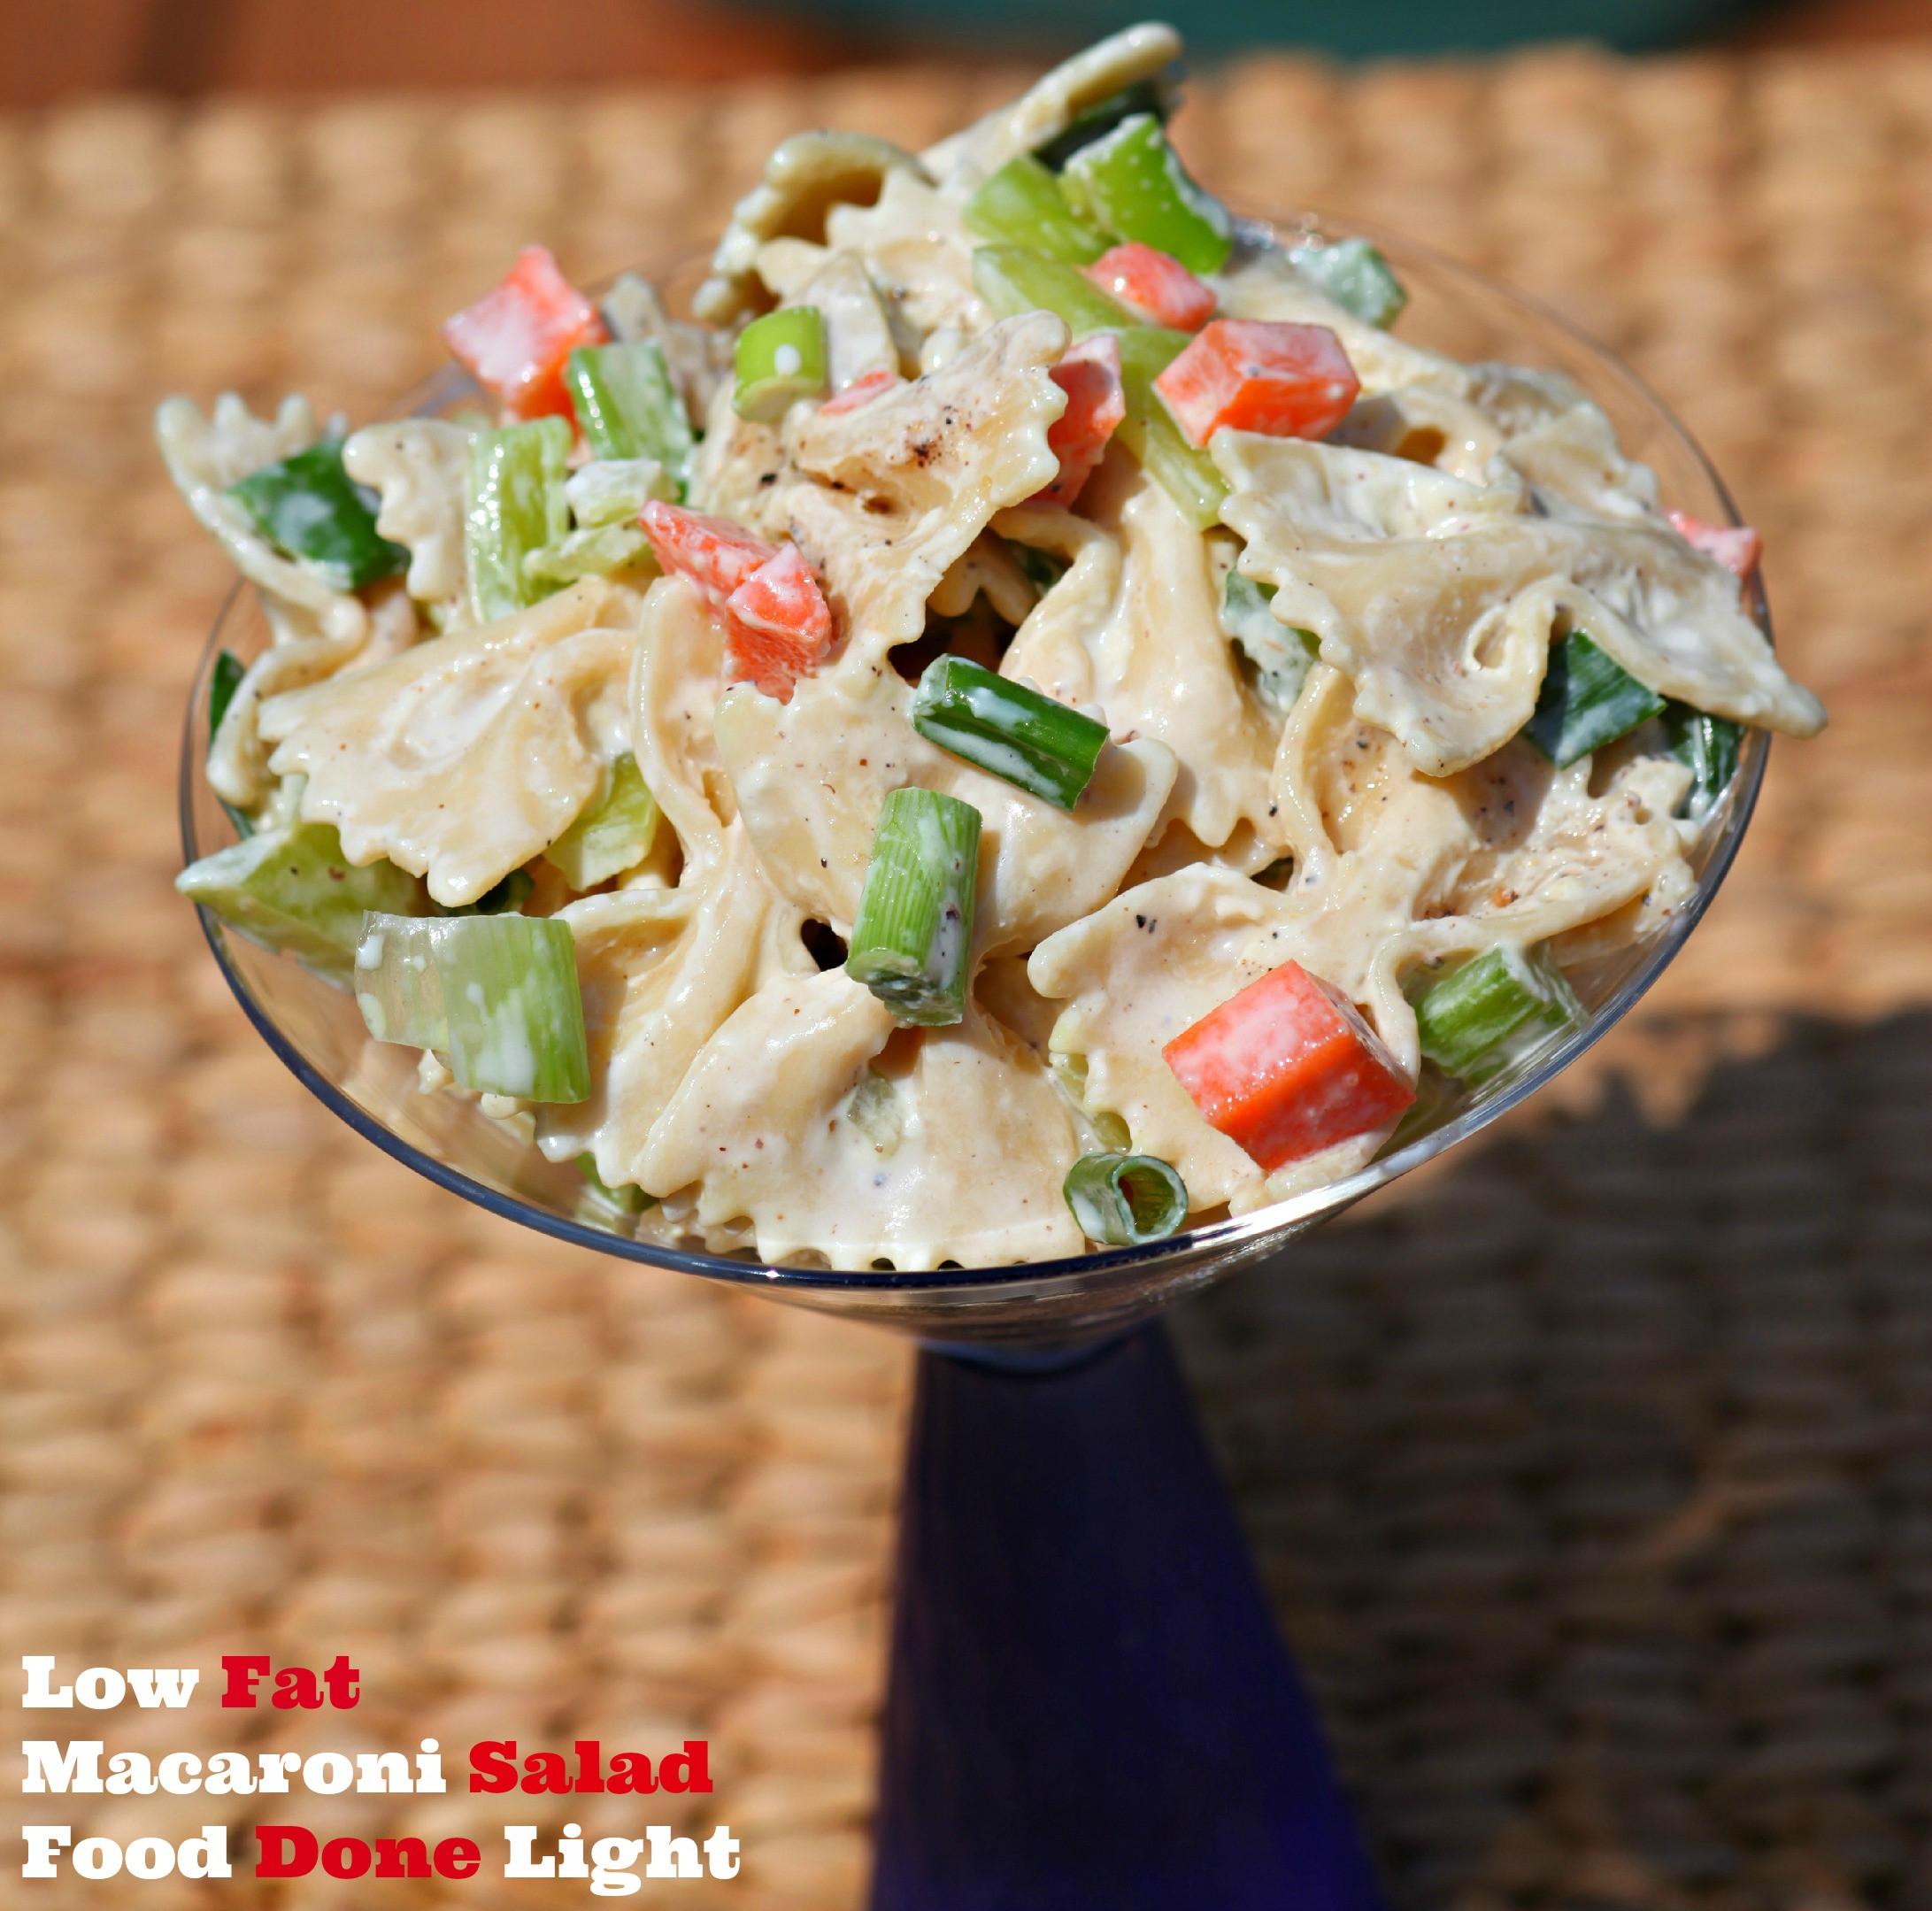 Low Calorie Macaroni Salad Low Fat Macaroni Salad